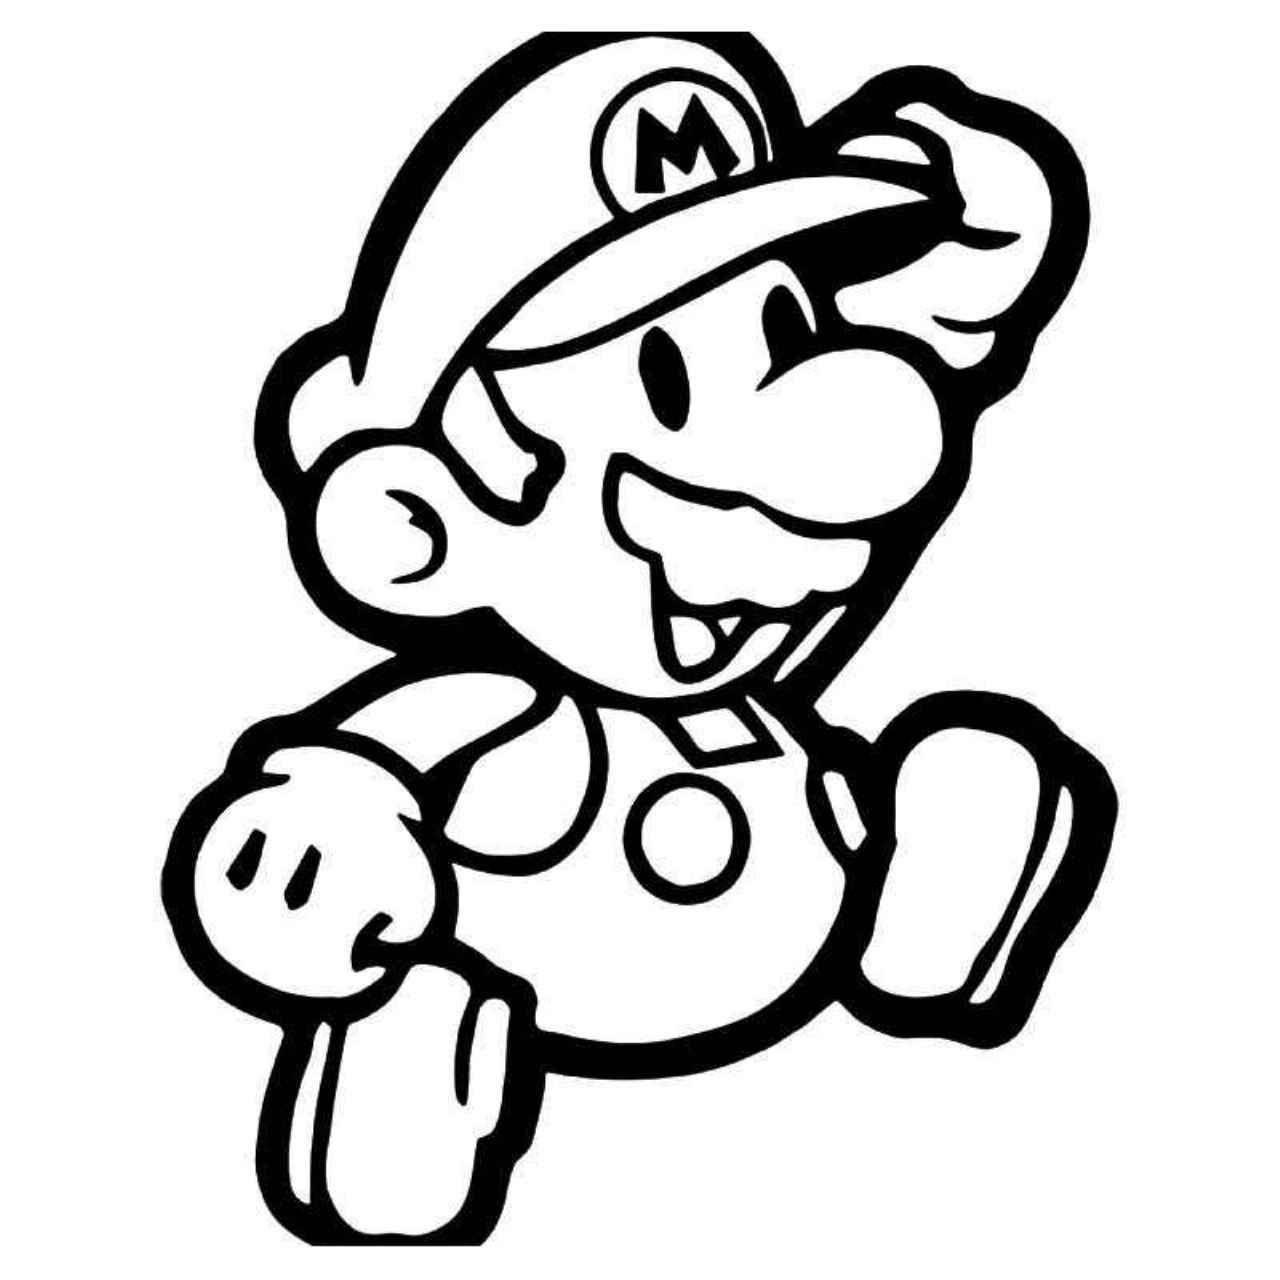 Super Mario Gaming 1 Vinyl Decal Sticker